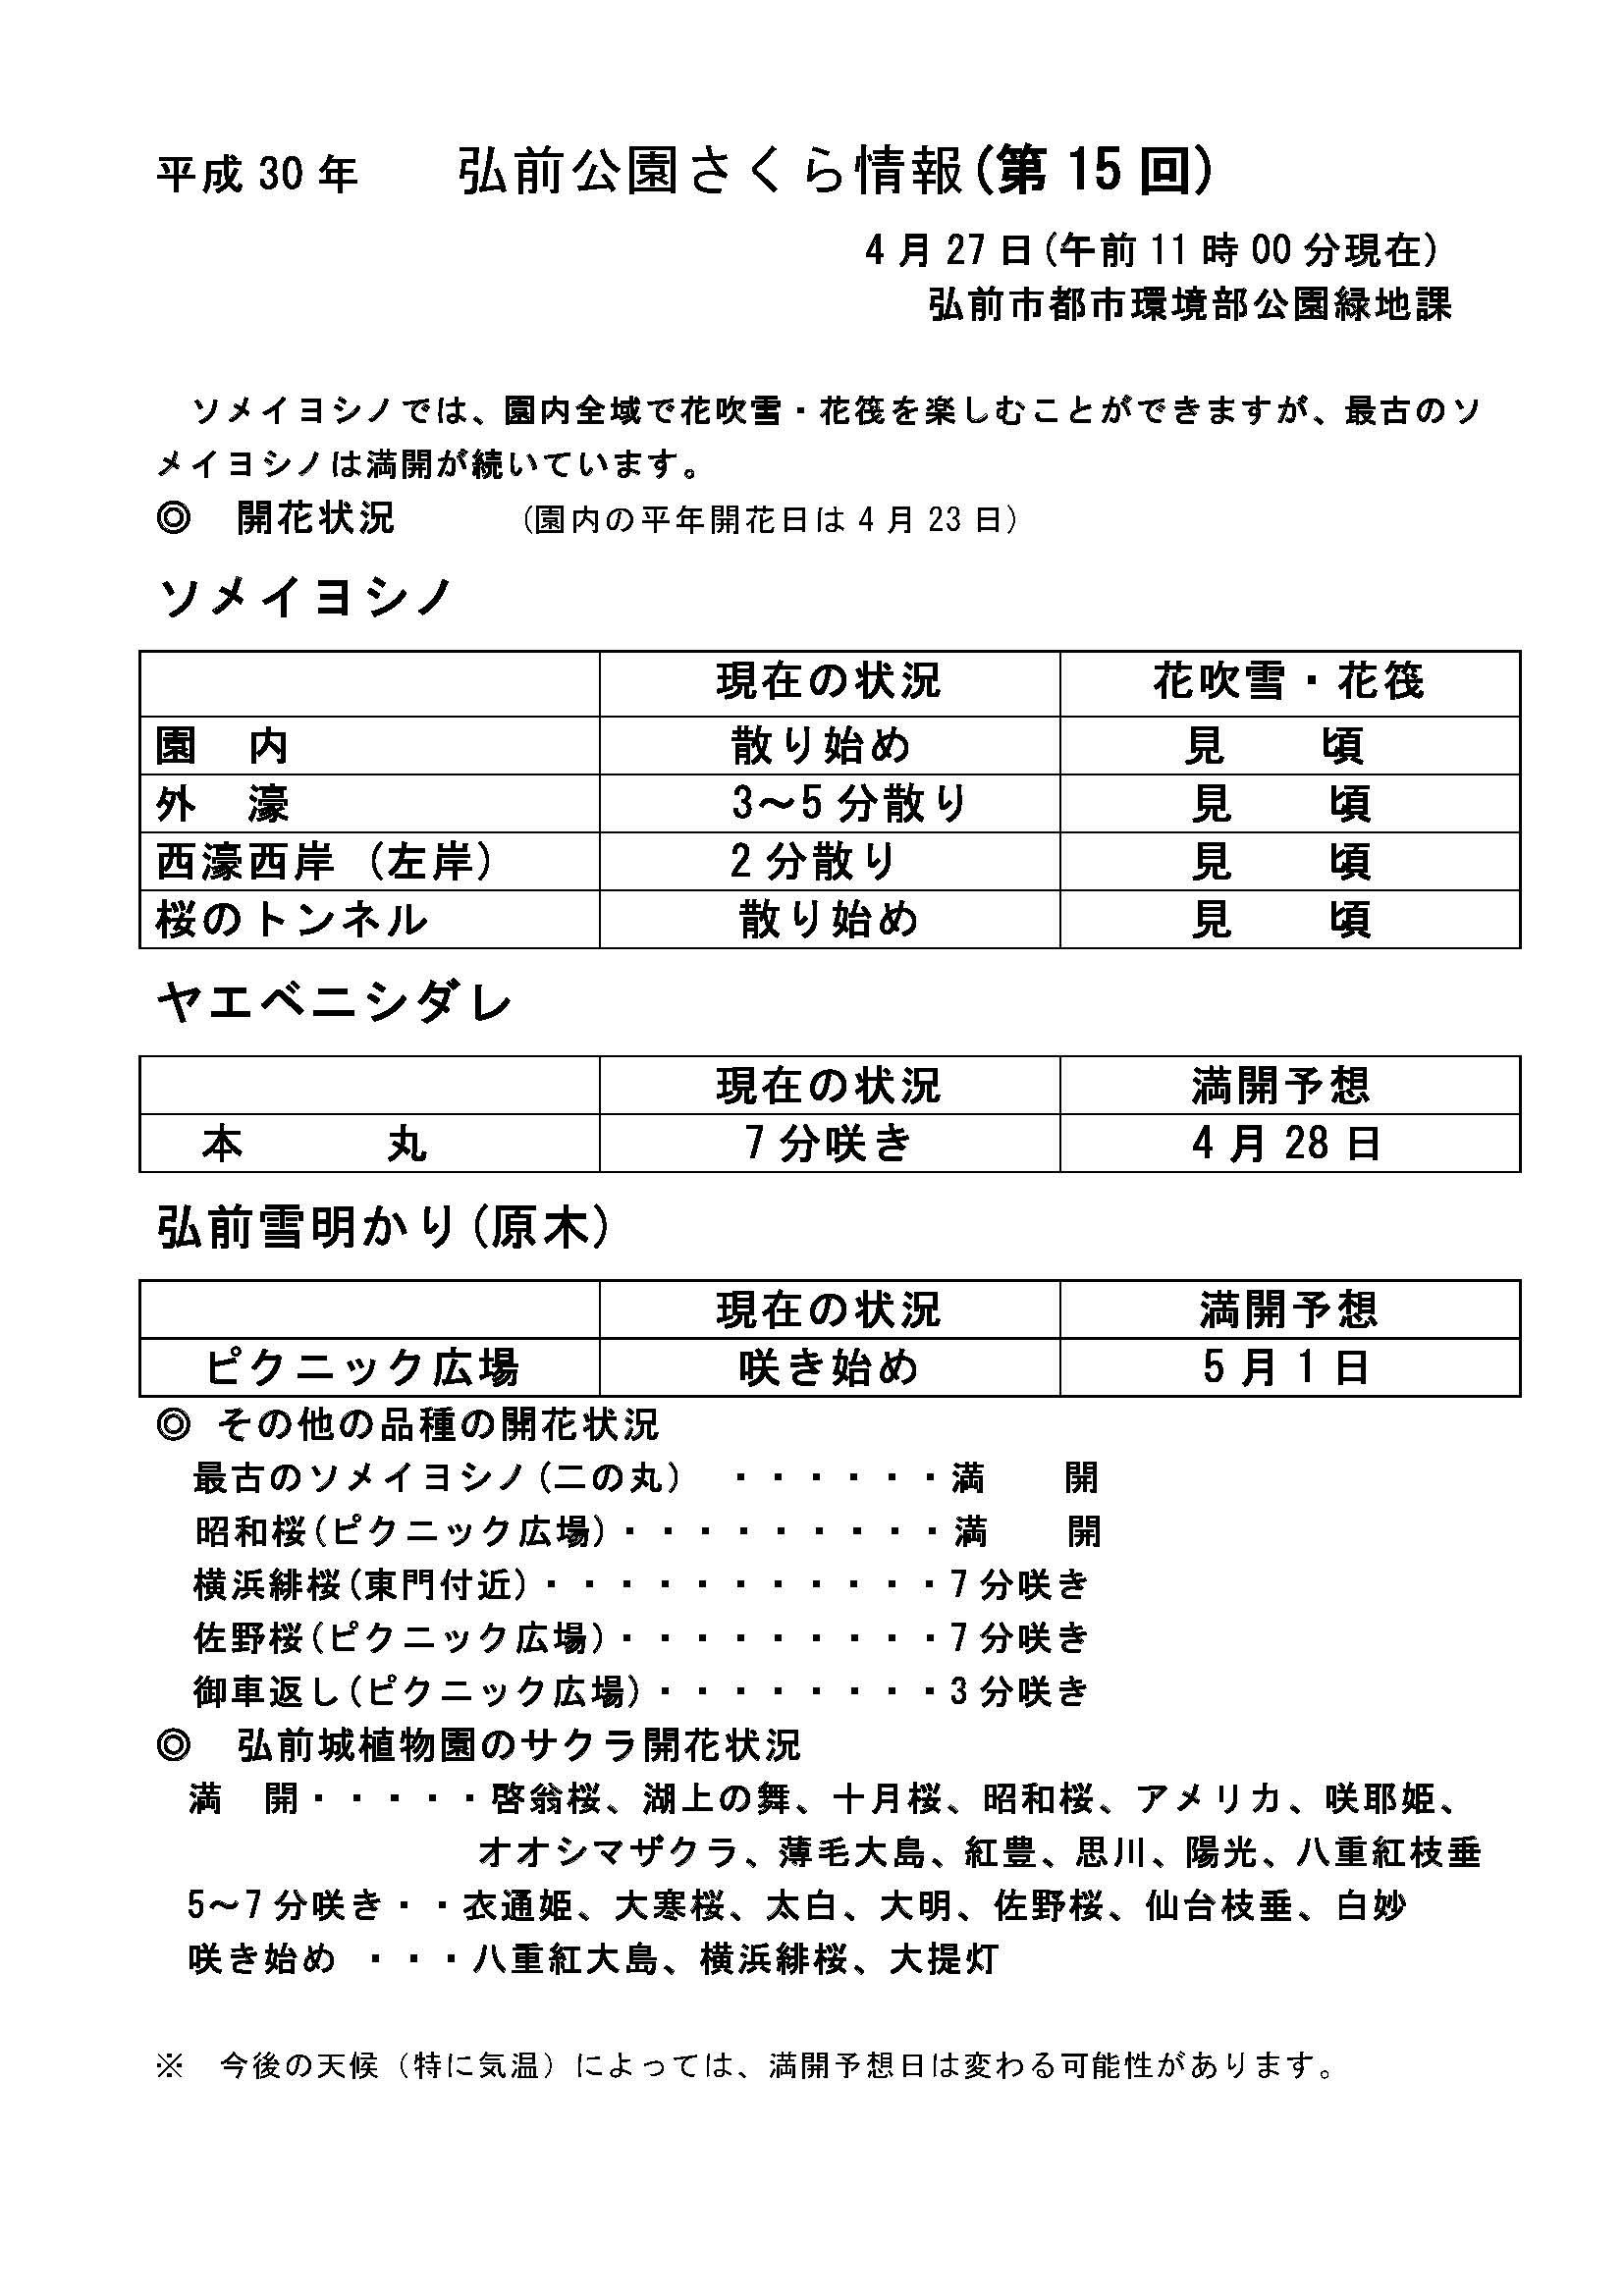 2018年4月27日付 弘前公園さくら情報(第15回)【弘前公園・弘前城】